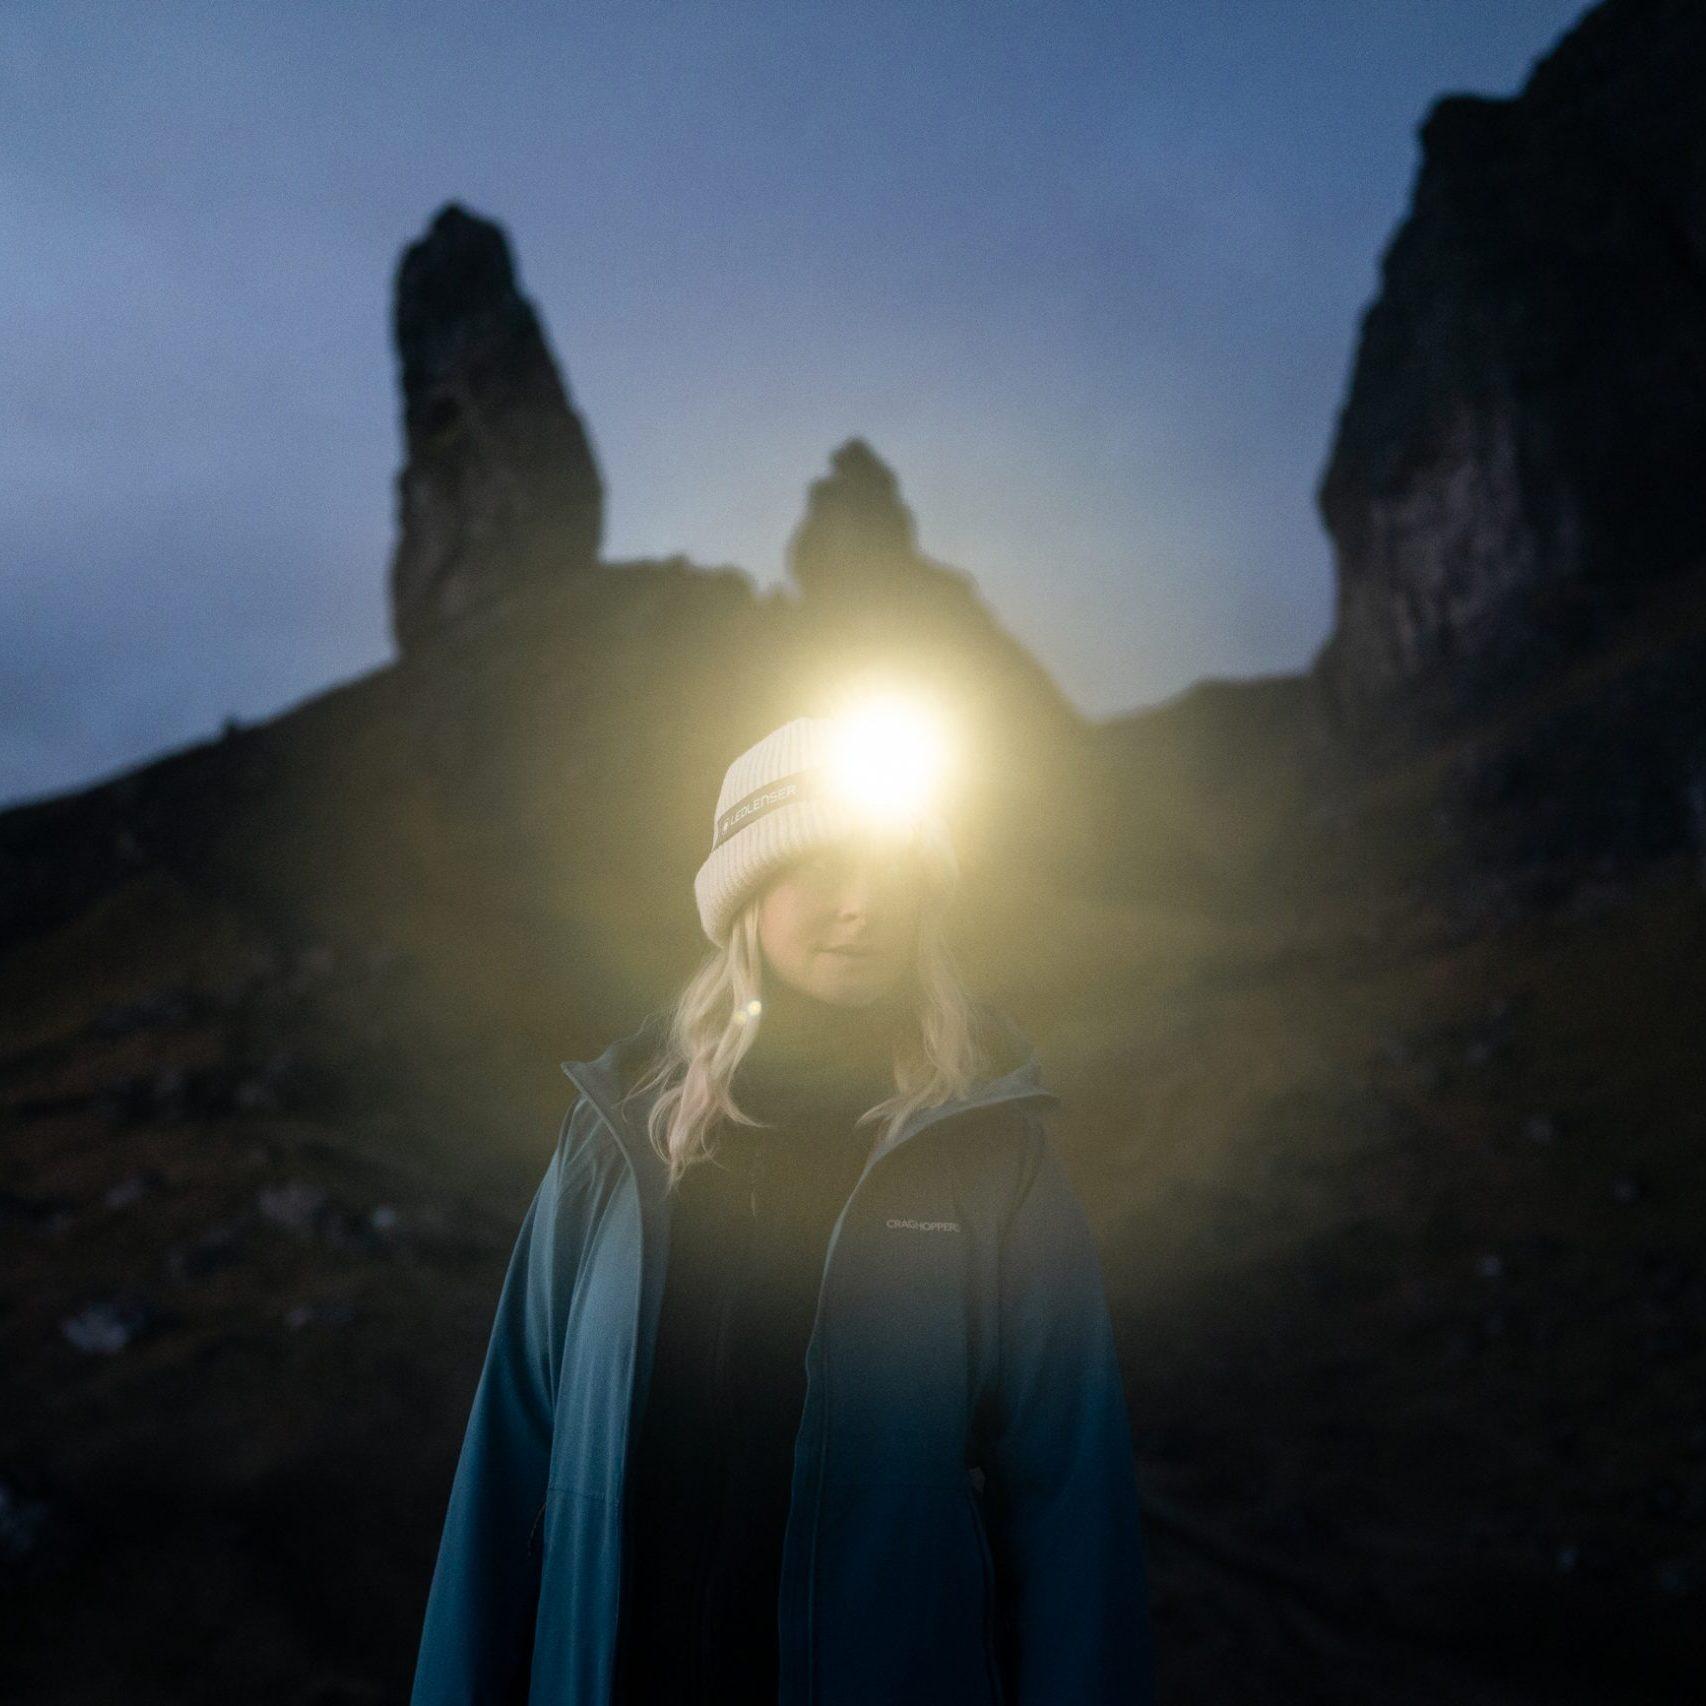 headtorch-light-darkness